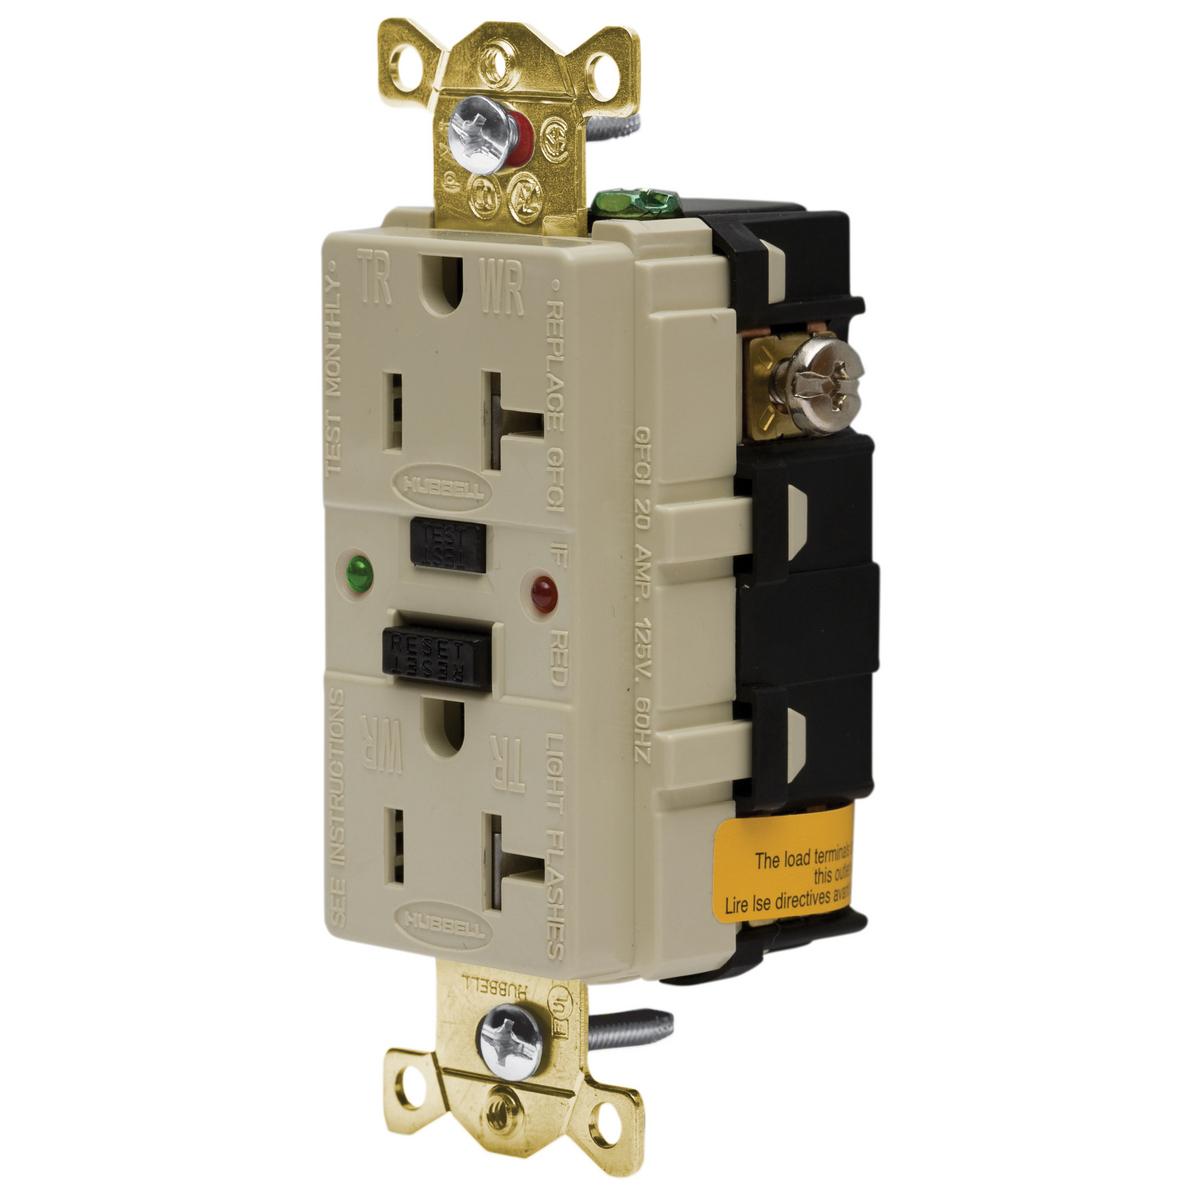 Hubbell GFR5362SGI 20 Amp 125 Volt 2-Pole 3-Wire NEMA 5-20R Ivory GFCI Receptacle with LED Indicator